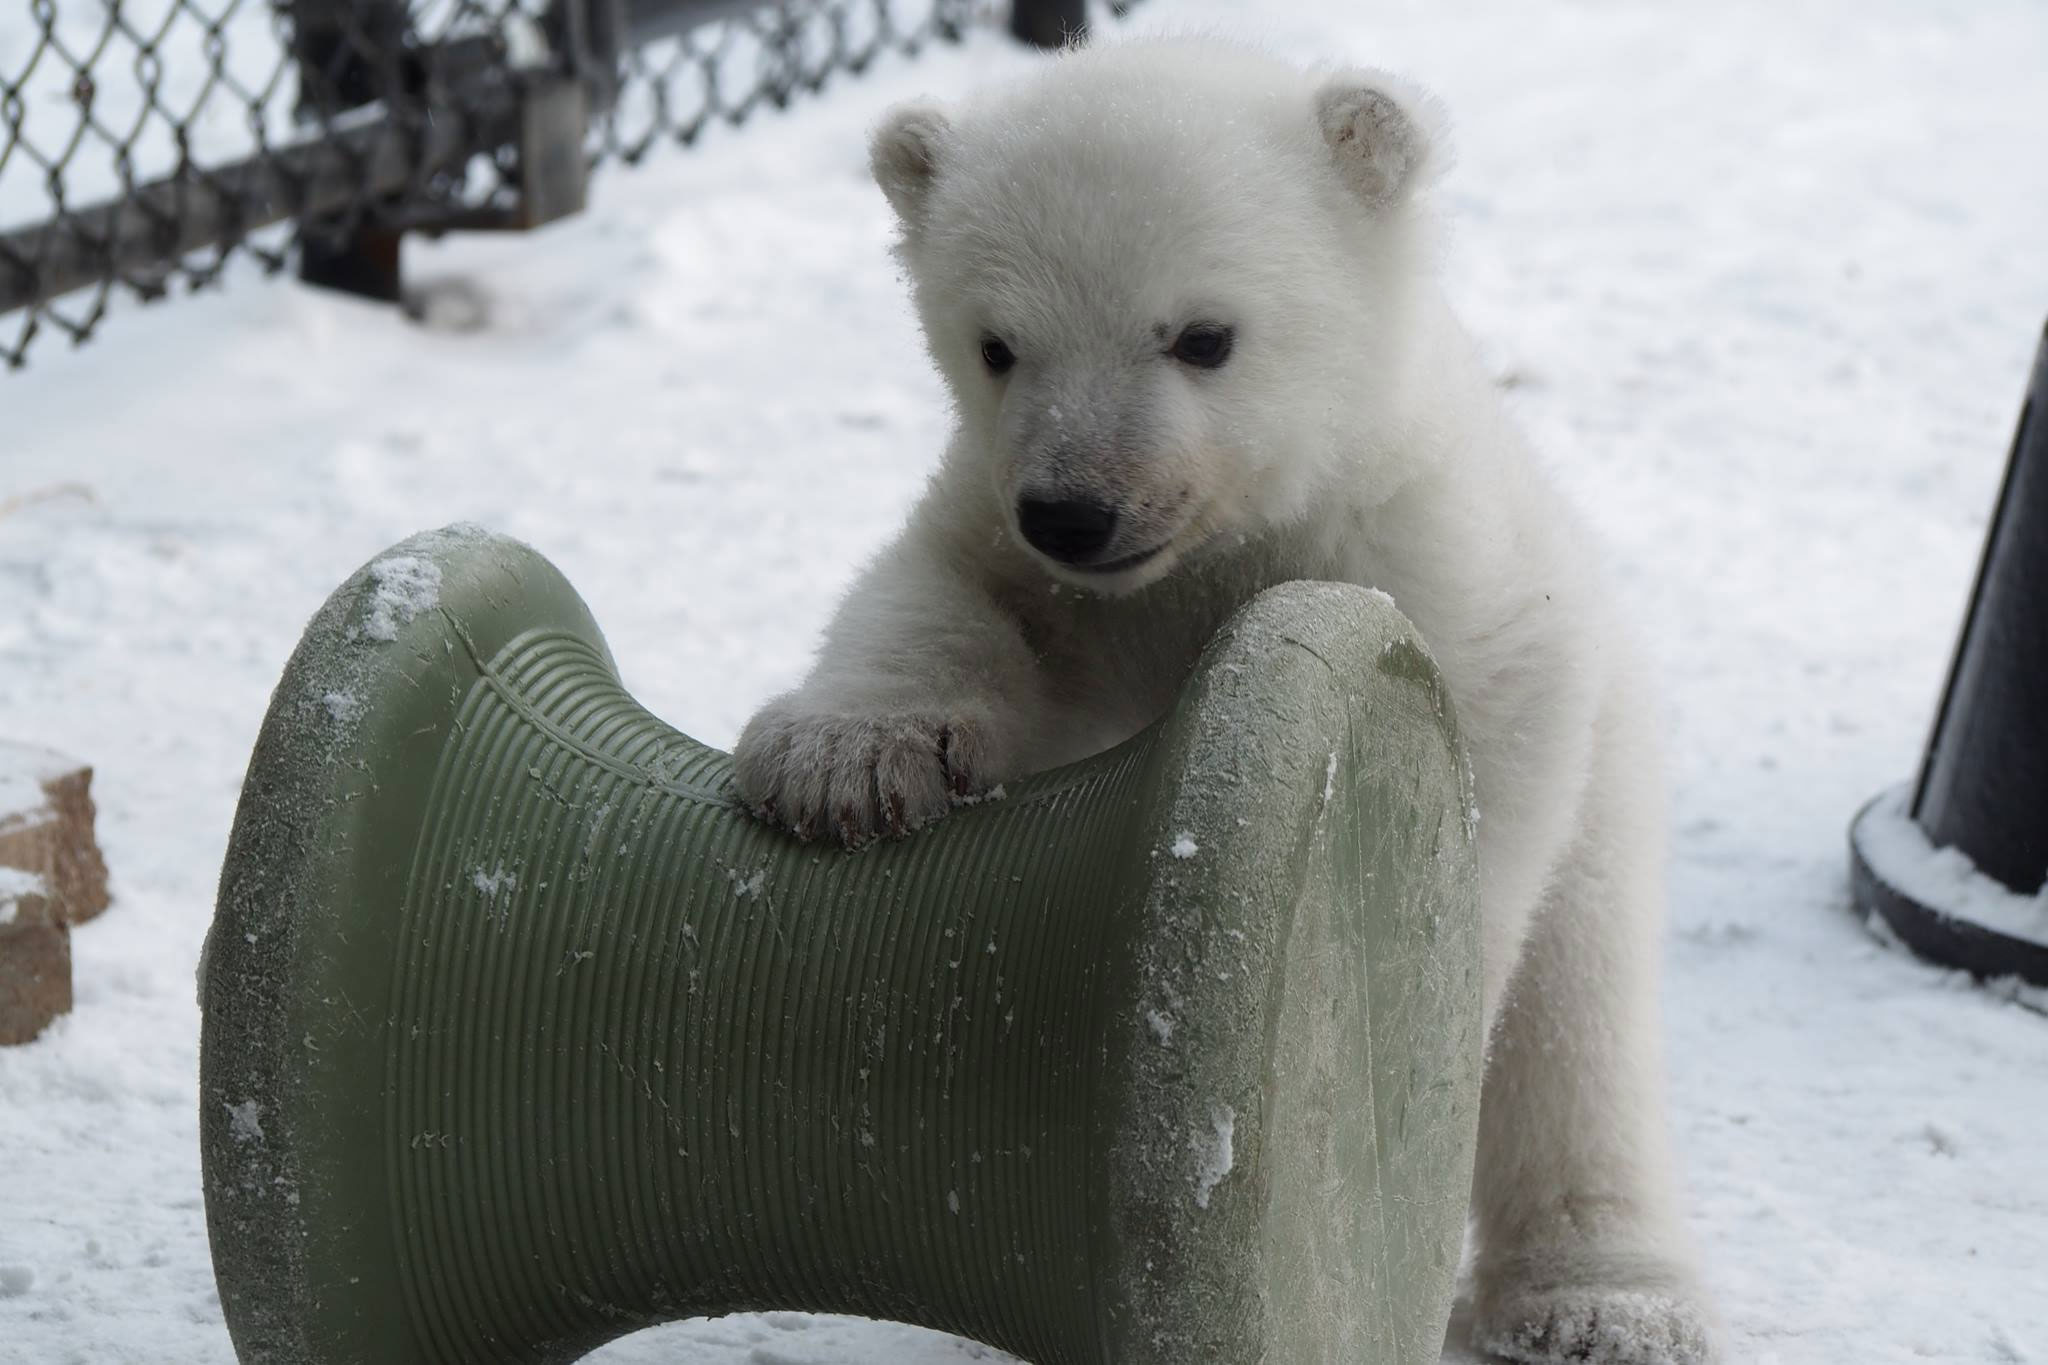 Toronto Zoo's polar bear cub at three months old on Feb. 12, 2016. TORONTO ZOO